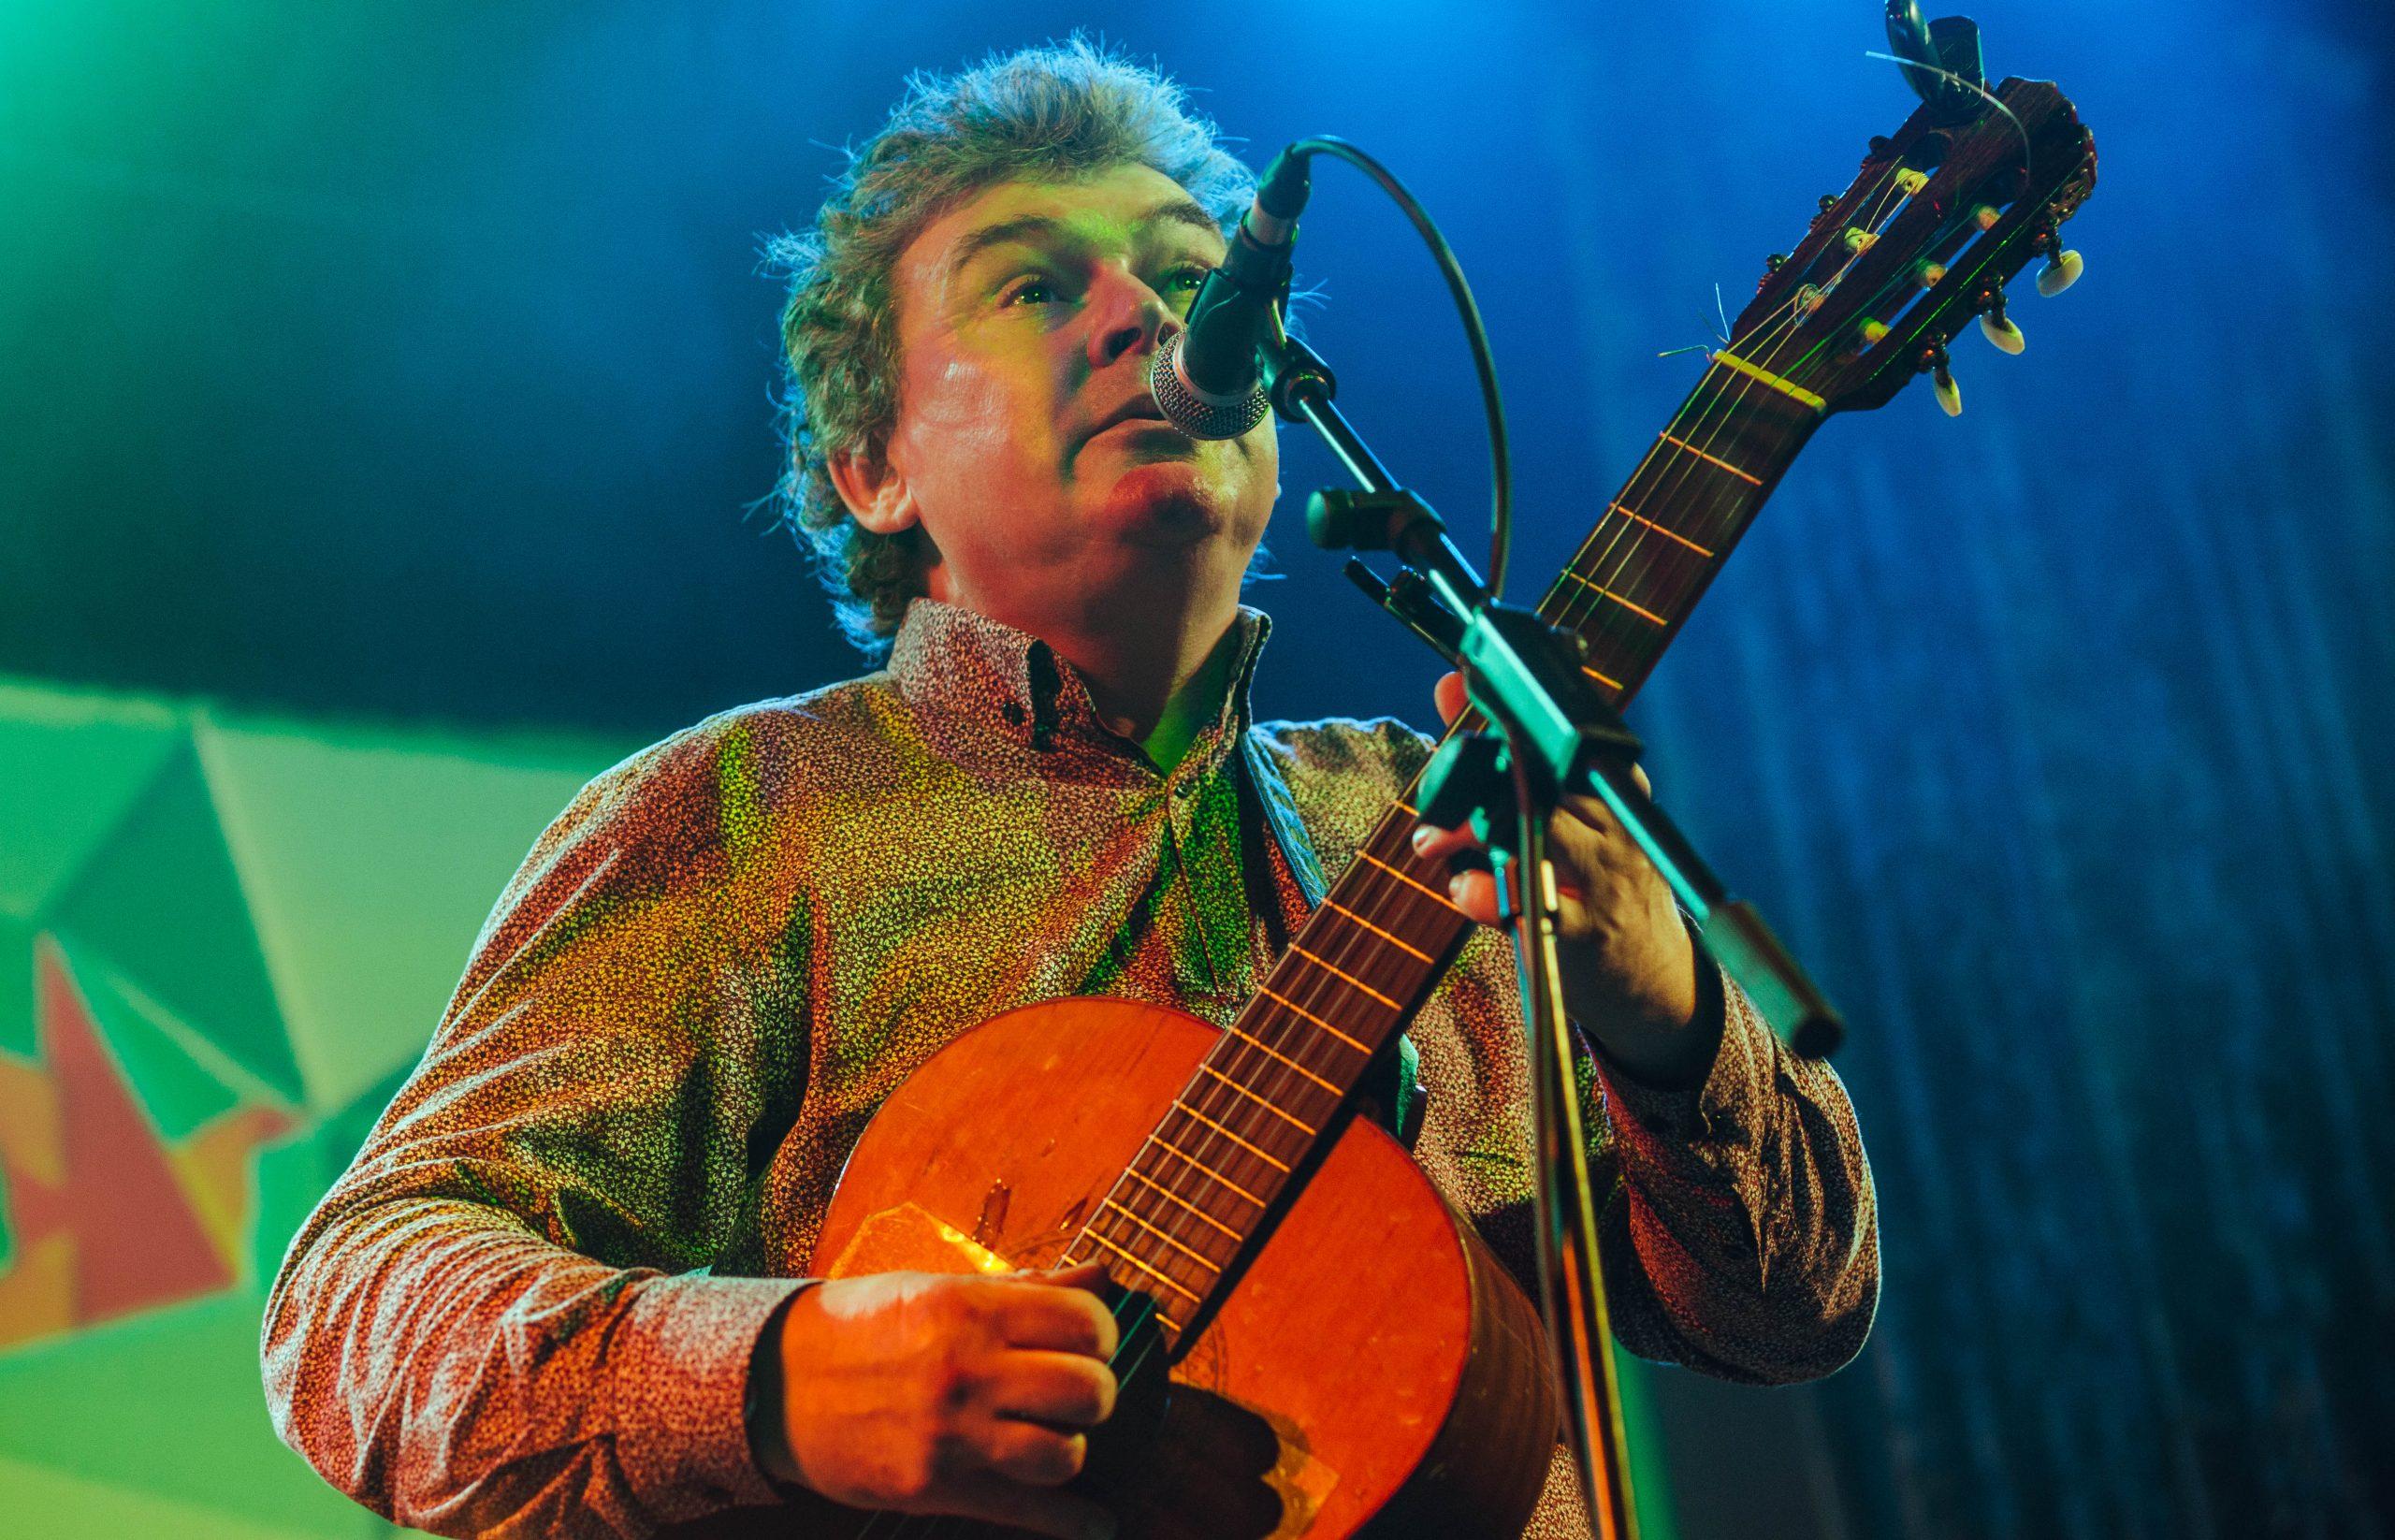 John Spillane, First Fortnight, Kino, Cork, 11-01-20-1